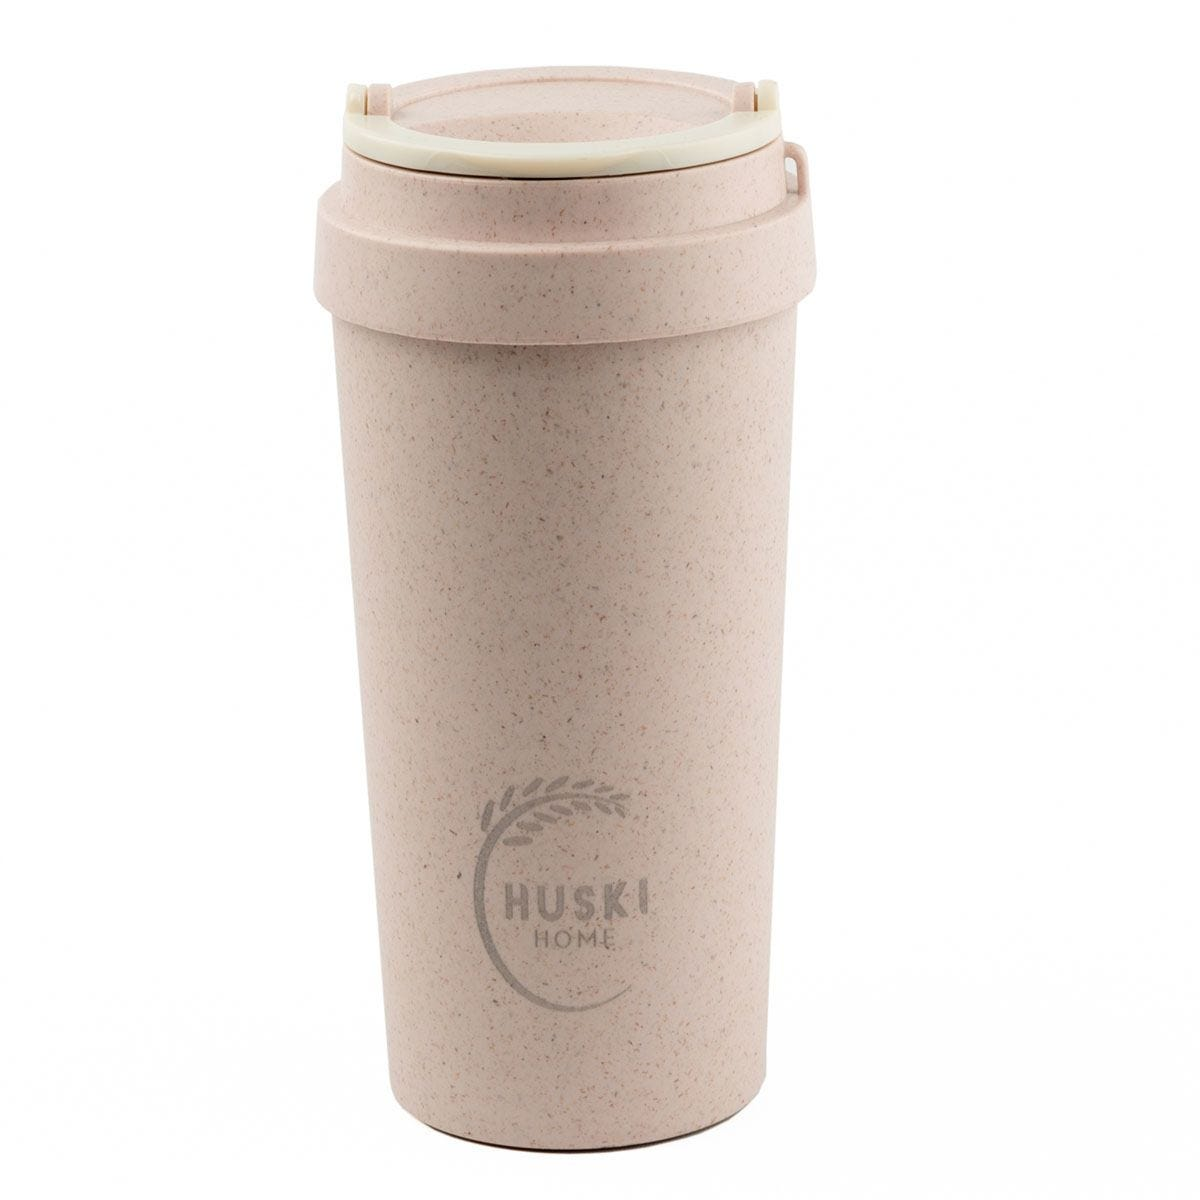 Huski Home Sustainable Rice Husk Travel Cup - Rose